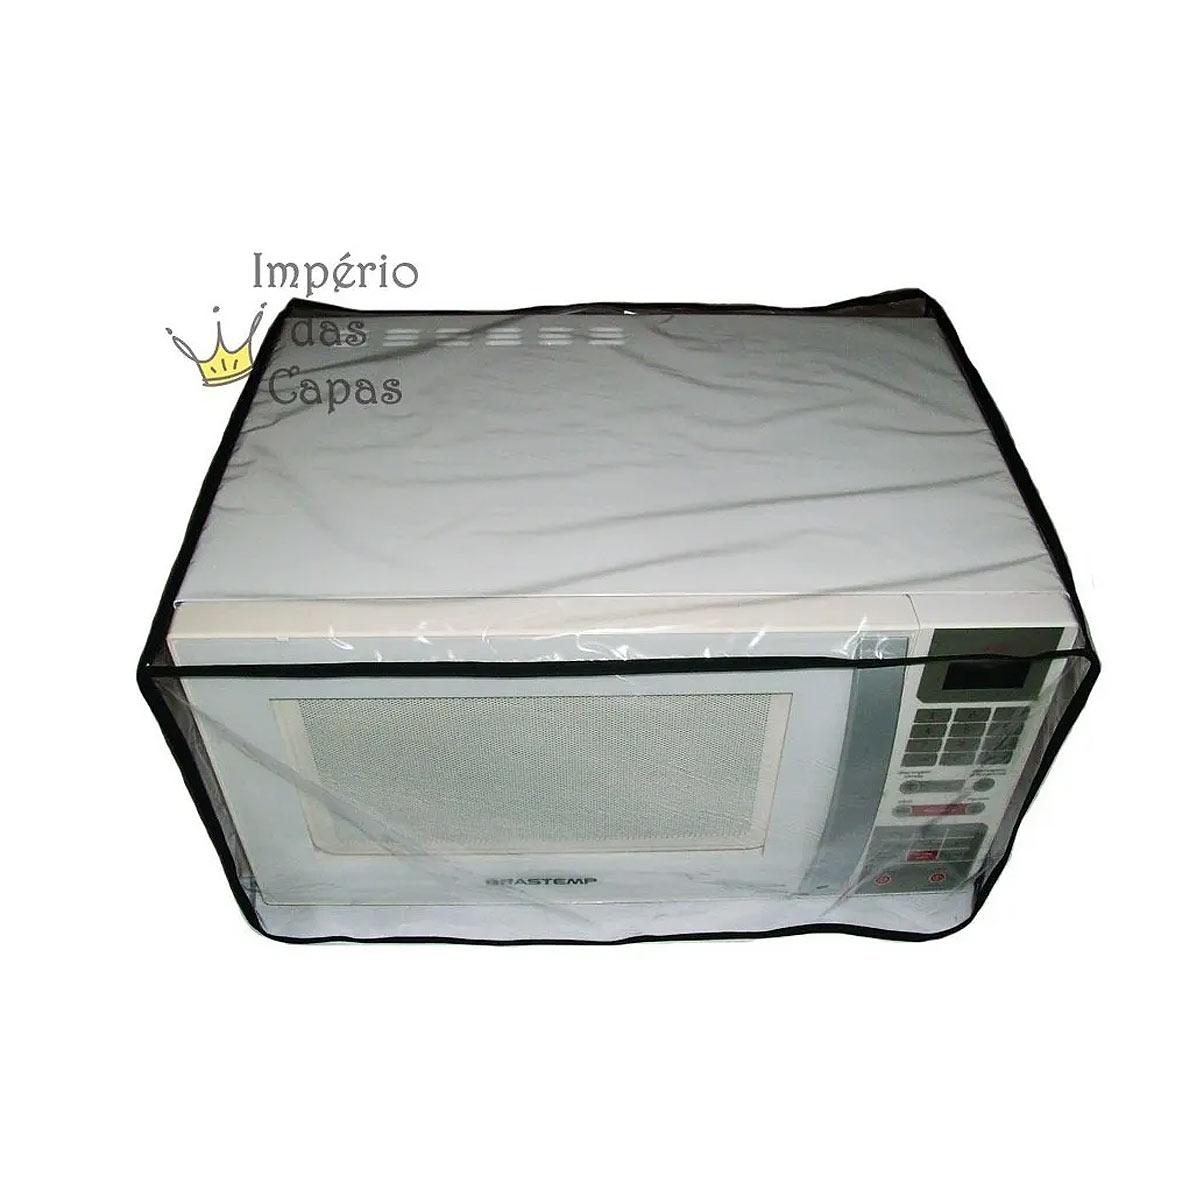 Capa Para Forno Microondas 20 L - Em Pvc Cristal - Tam P